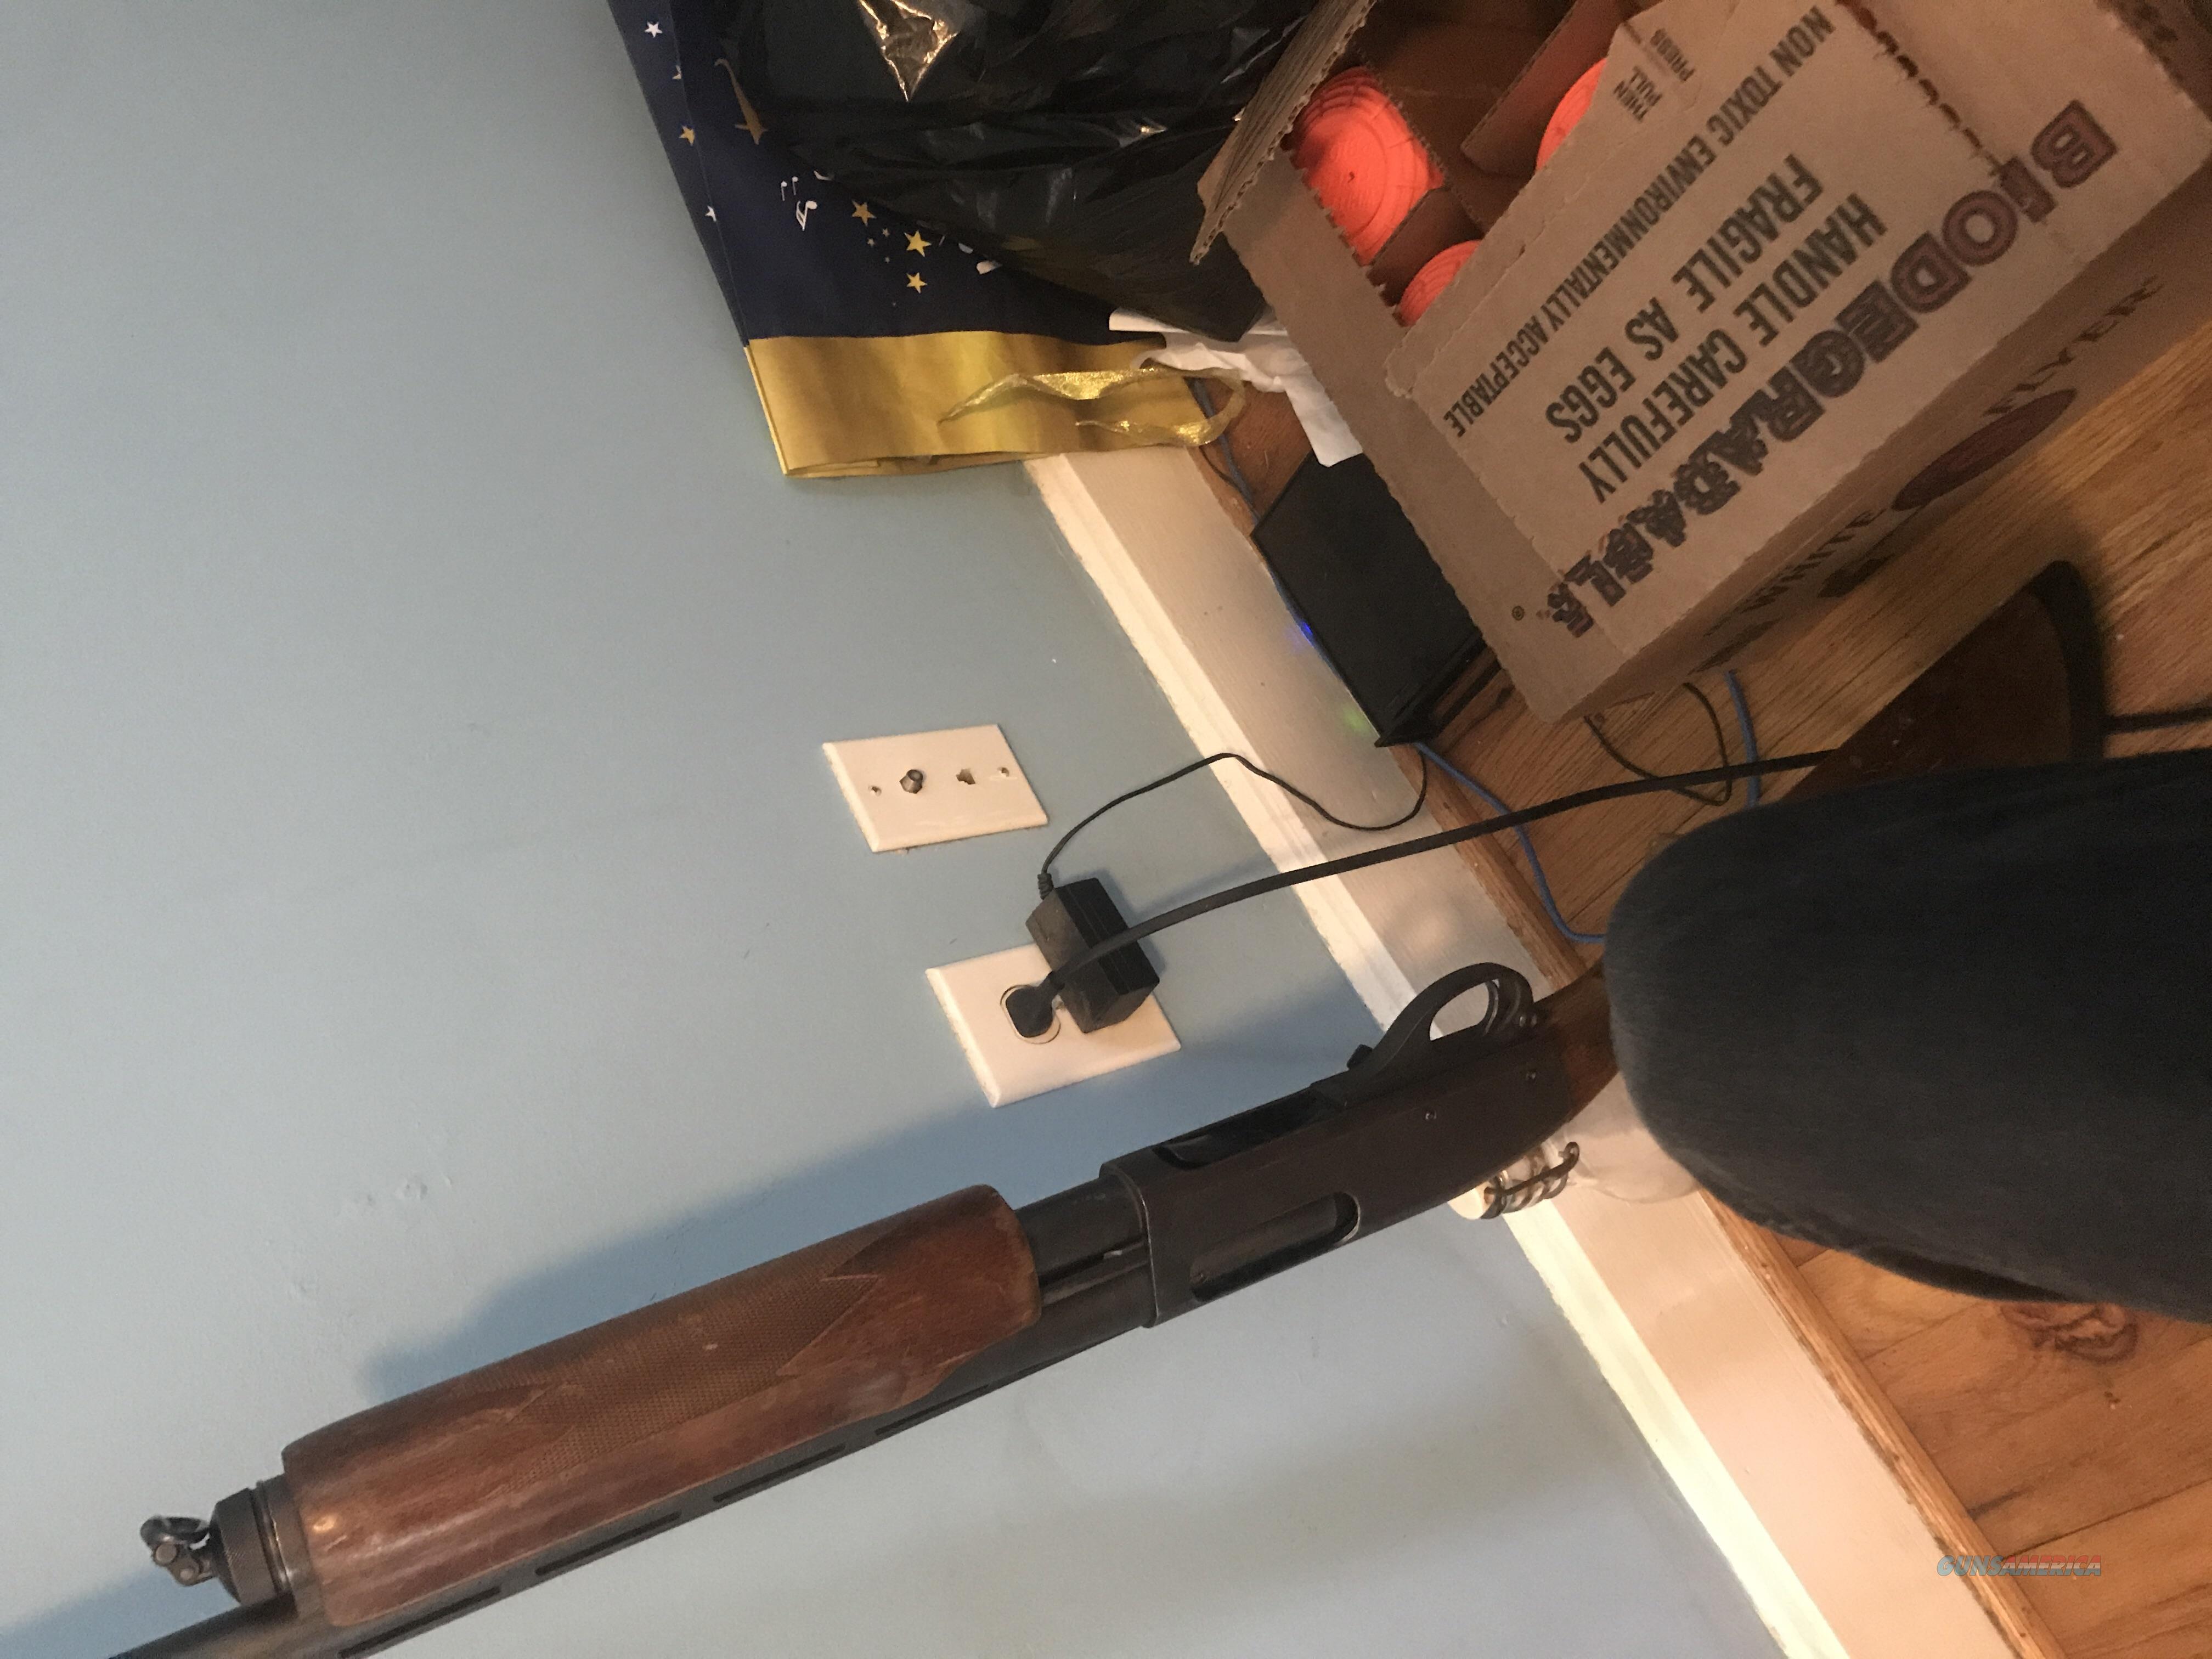 Remington 870 Magnum 12 GA  Guns > Shotguns > Remington Shotguns  > Pump > Hunting